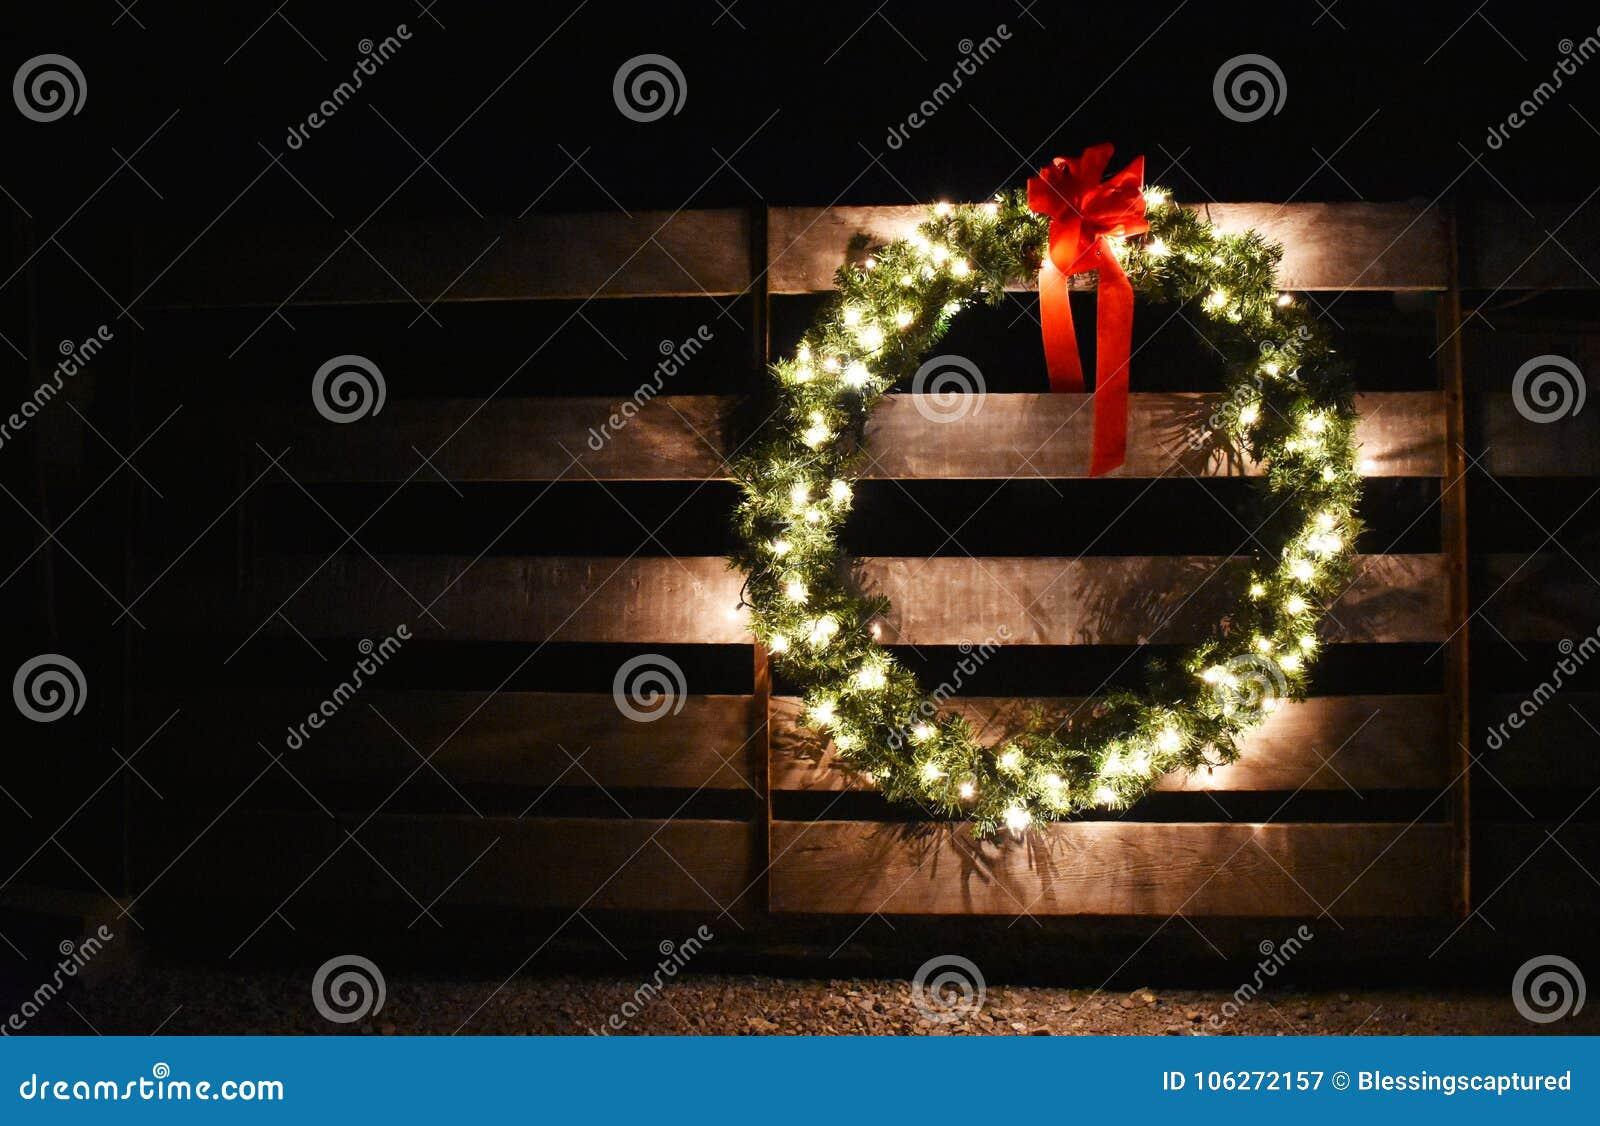 A Christmas Wreath On A Farm Gate Stock Image - Image of christmas ...